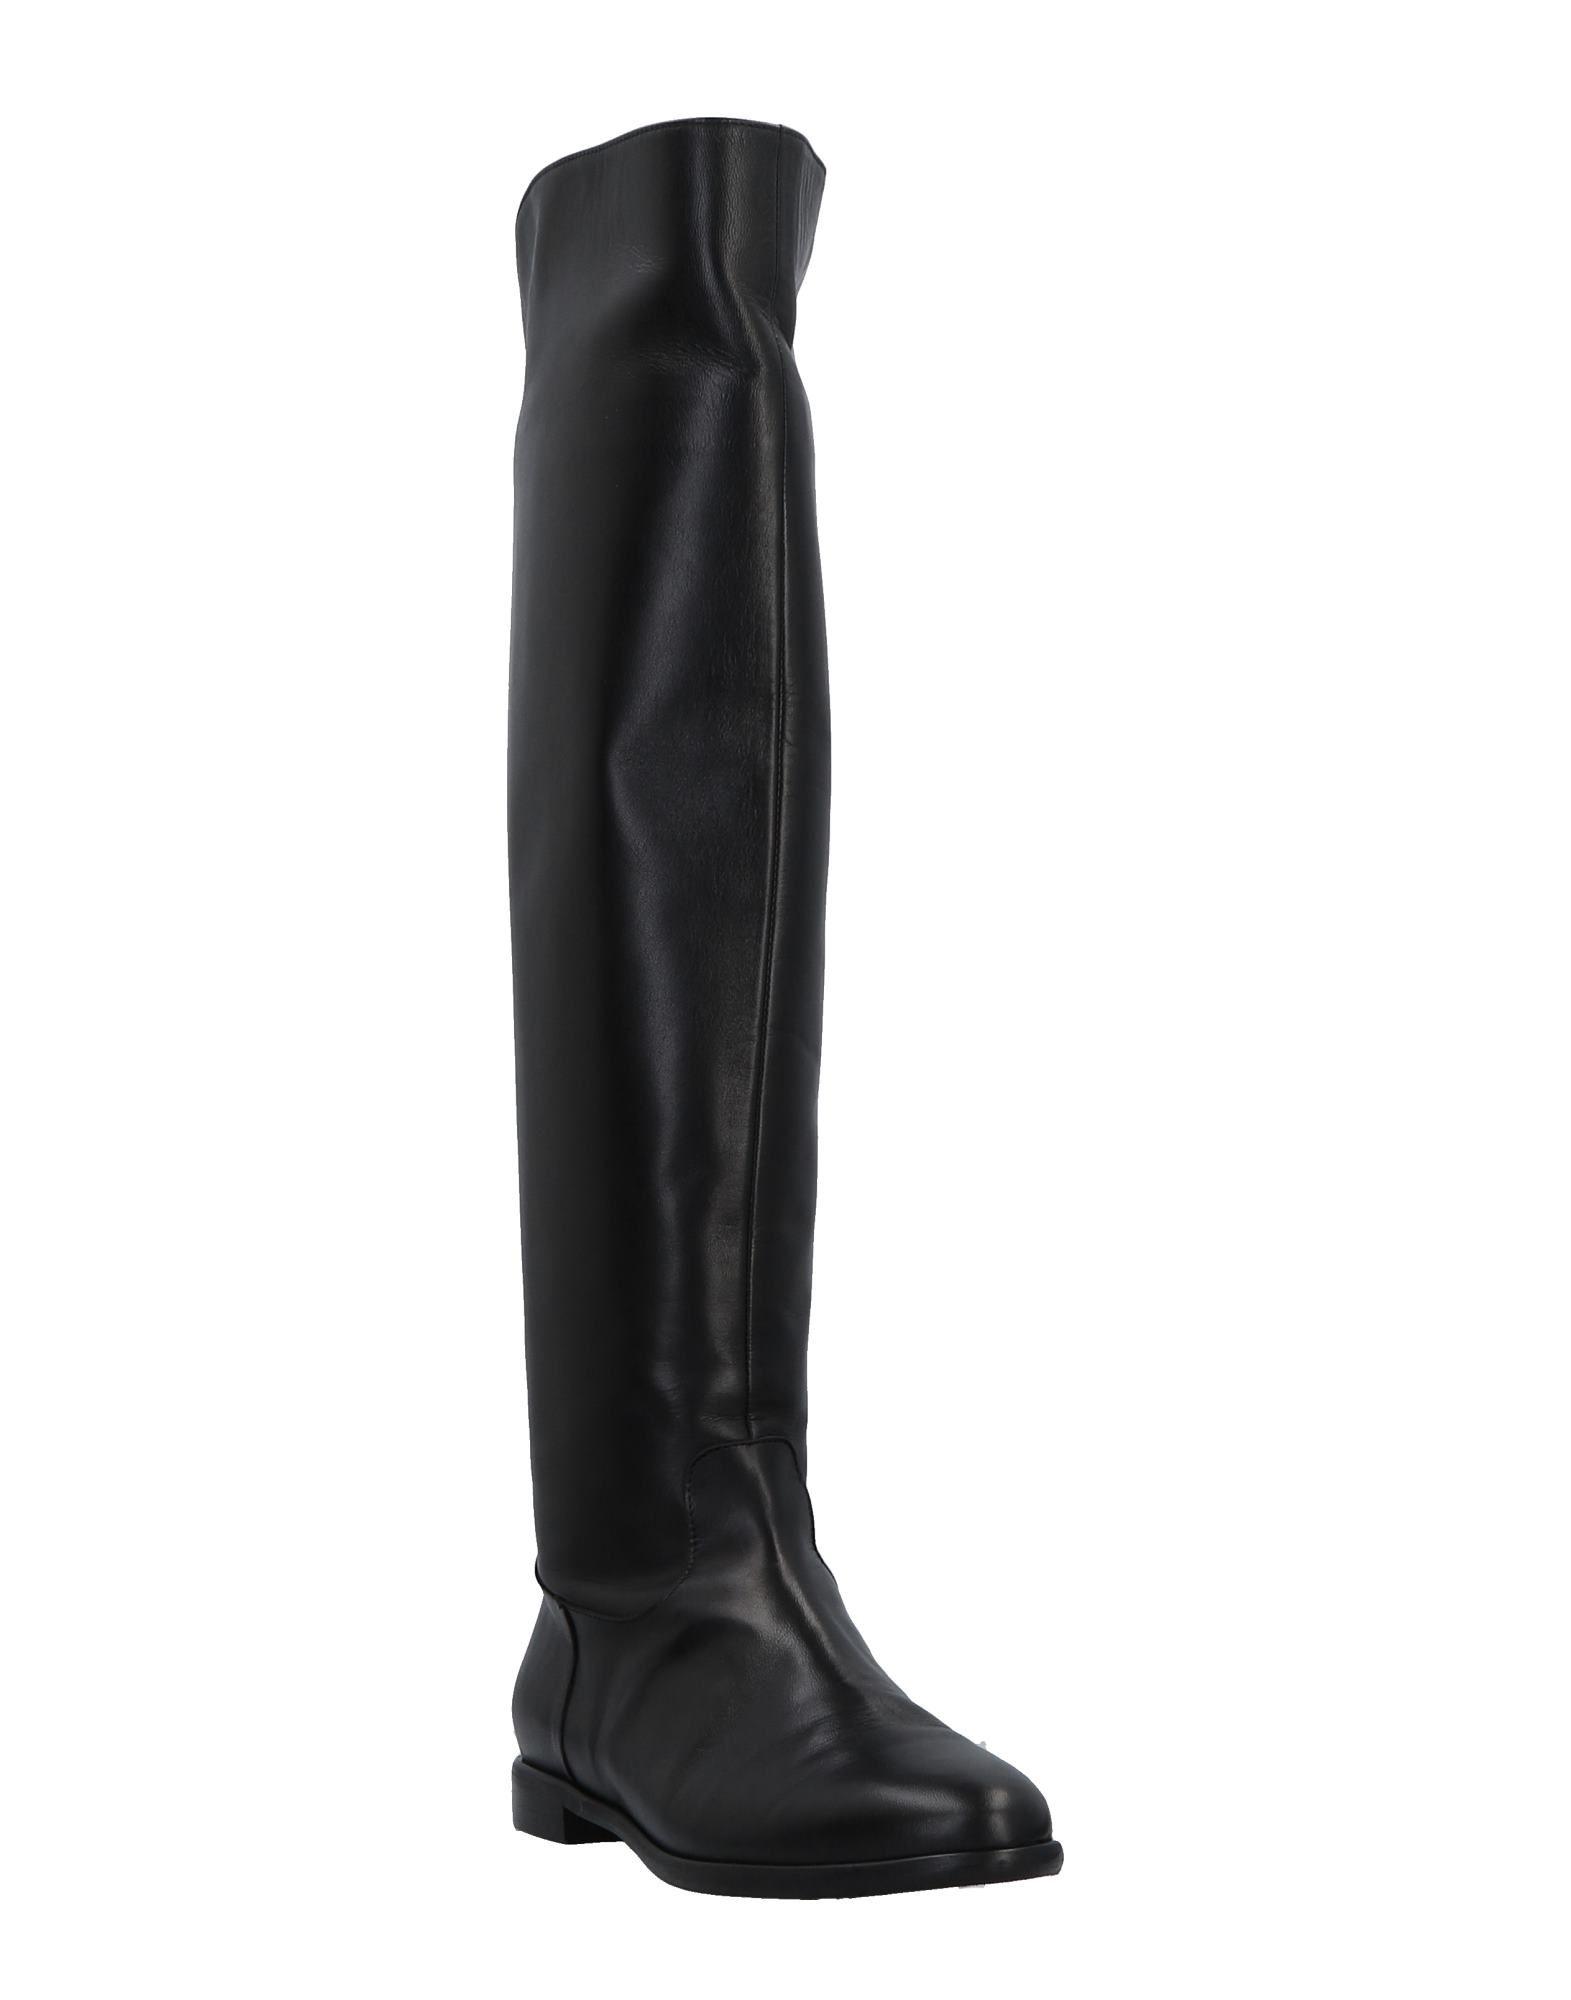 Stilvolle billige Schuhe Alan Jurno Jurno Jurno Stiefel Damen  11512324NJ 847efa